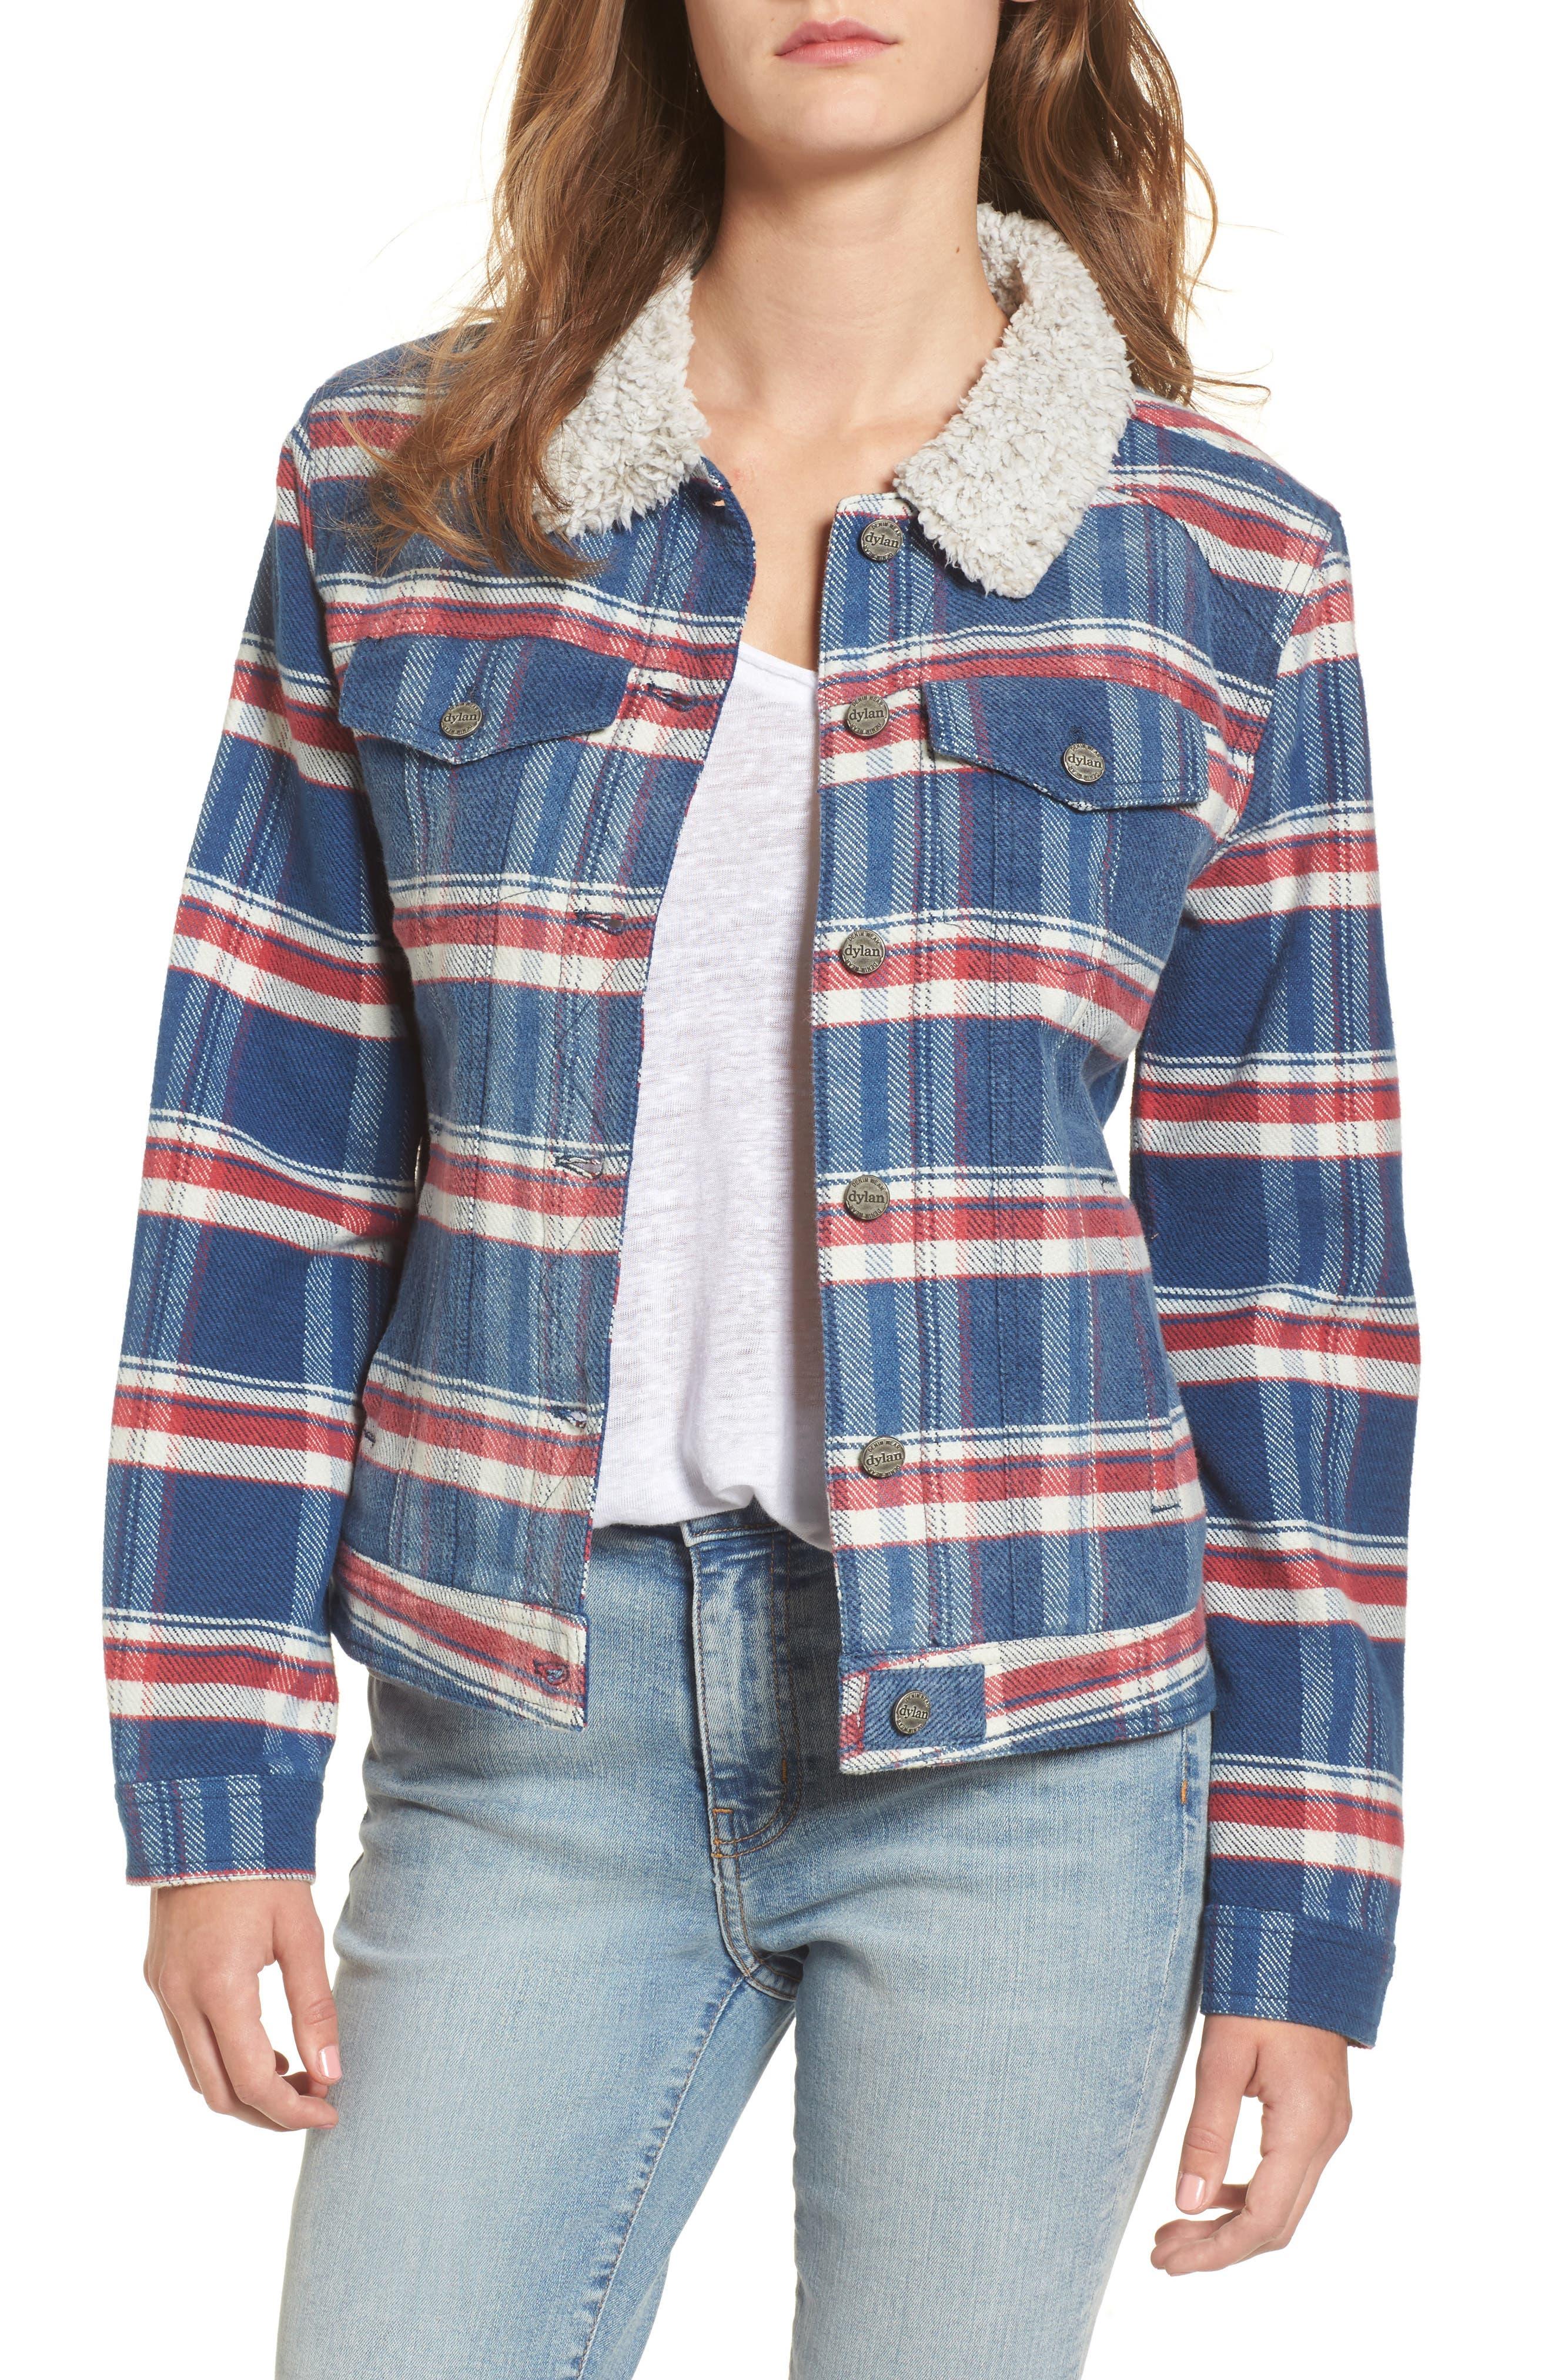 Ella Plaid Denim Jacket with Faux Shearling Collar,                         Main,                         color, Indigo/ Red Plaid